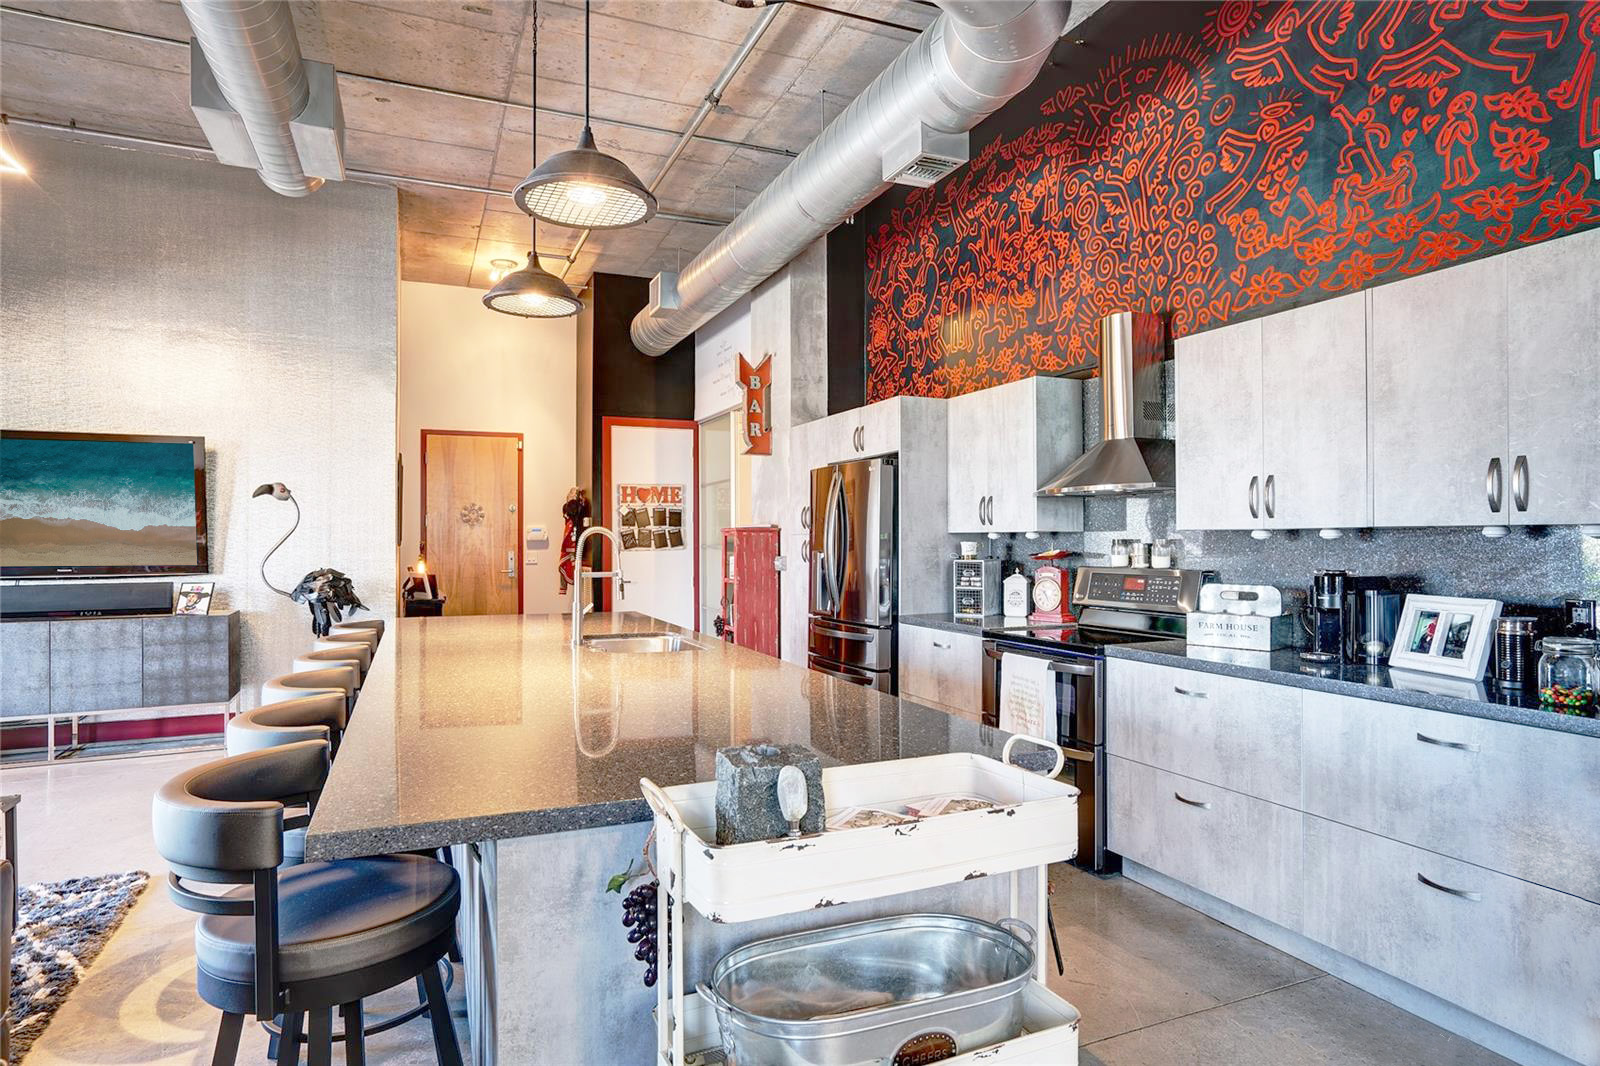 SOLD $500,000 - Avenue Lofts #402